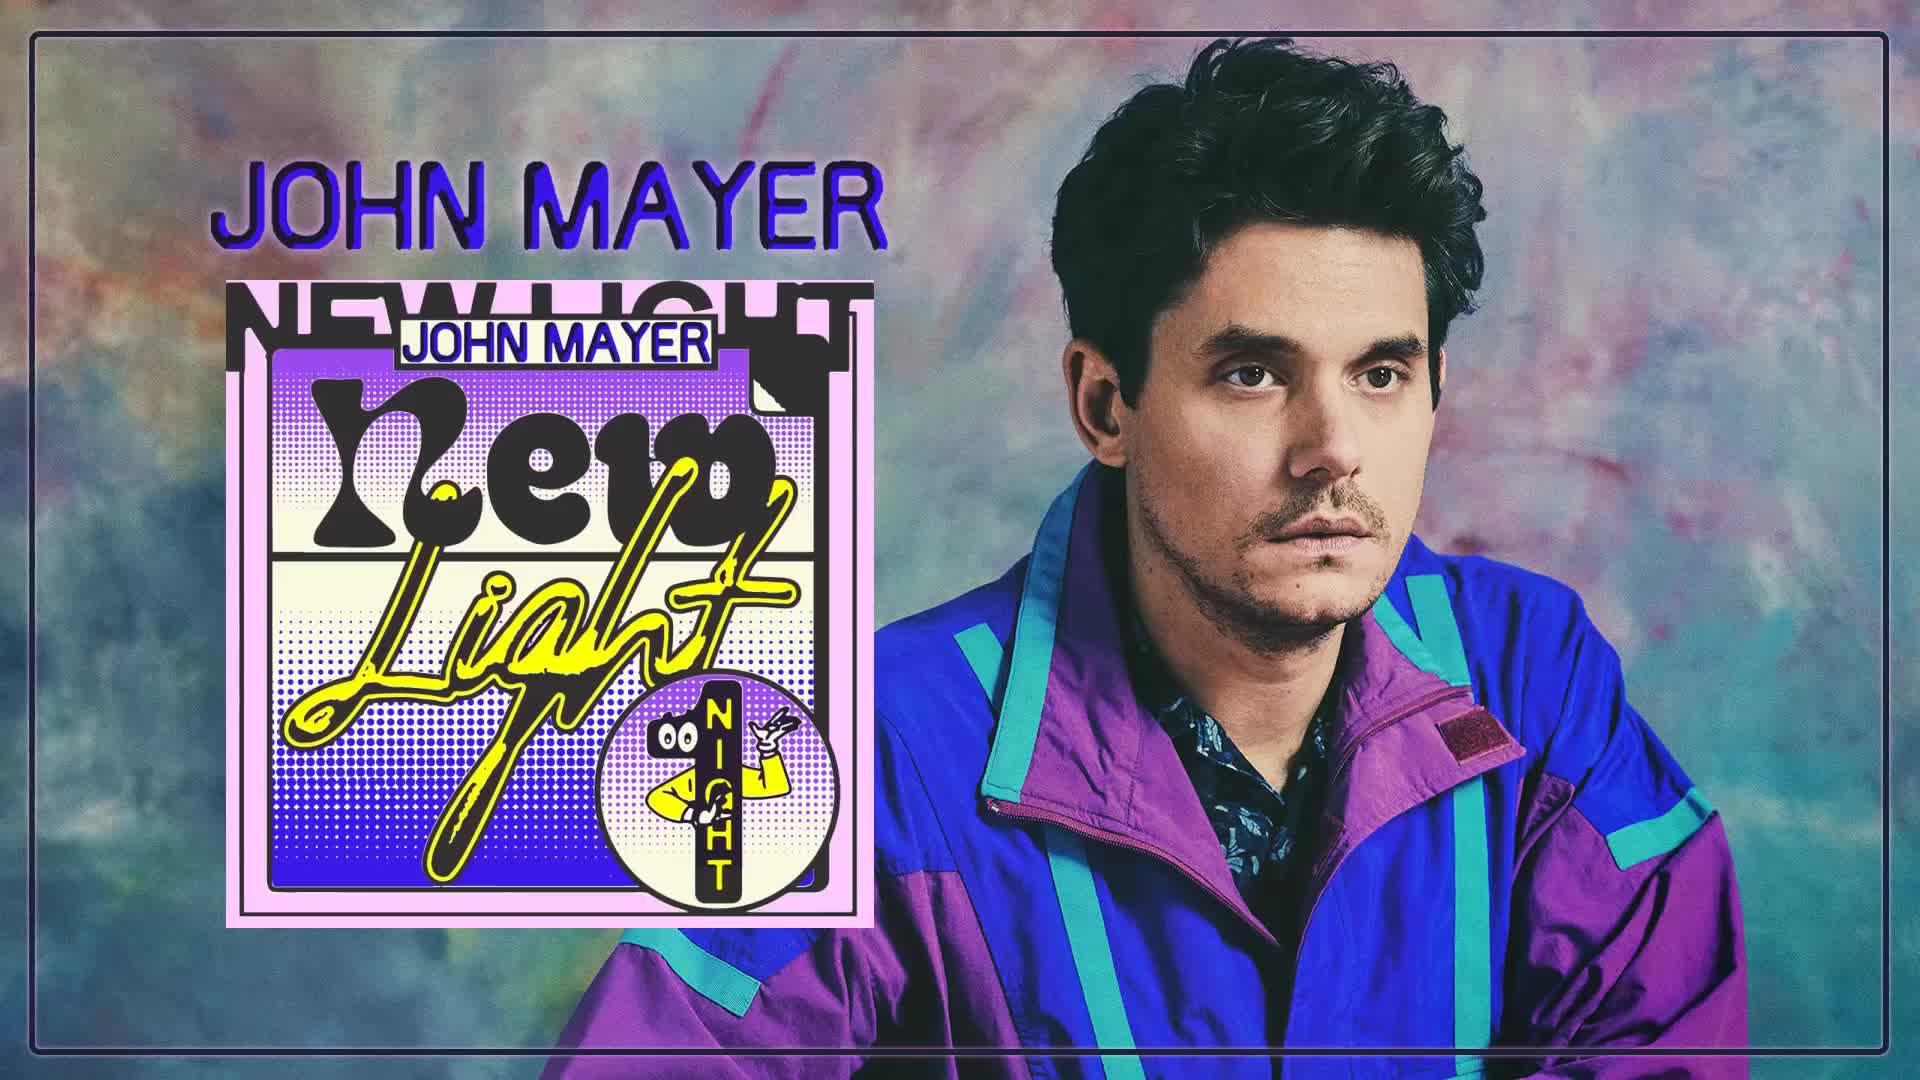 "John Mayer - New Light (Official Audio) 2PH7dK6SLC8. ""John Mayer ""New Light"""".. that music video though."